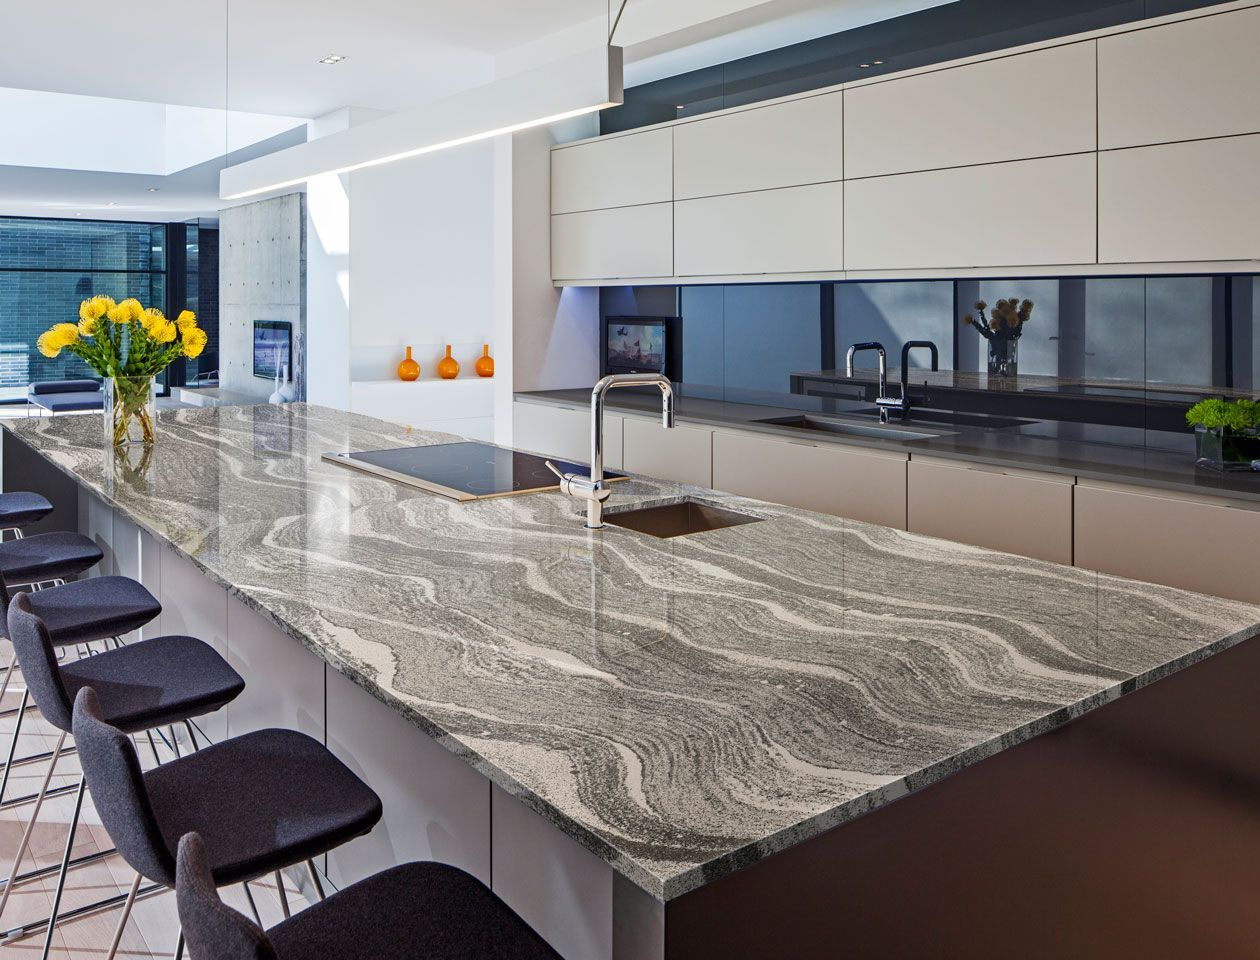 Granite Countertops Pros And Cons Maui Real Estate Guru Mauirealtor Quartz